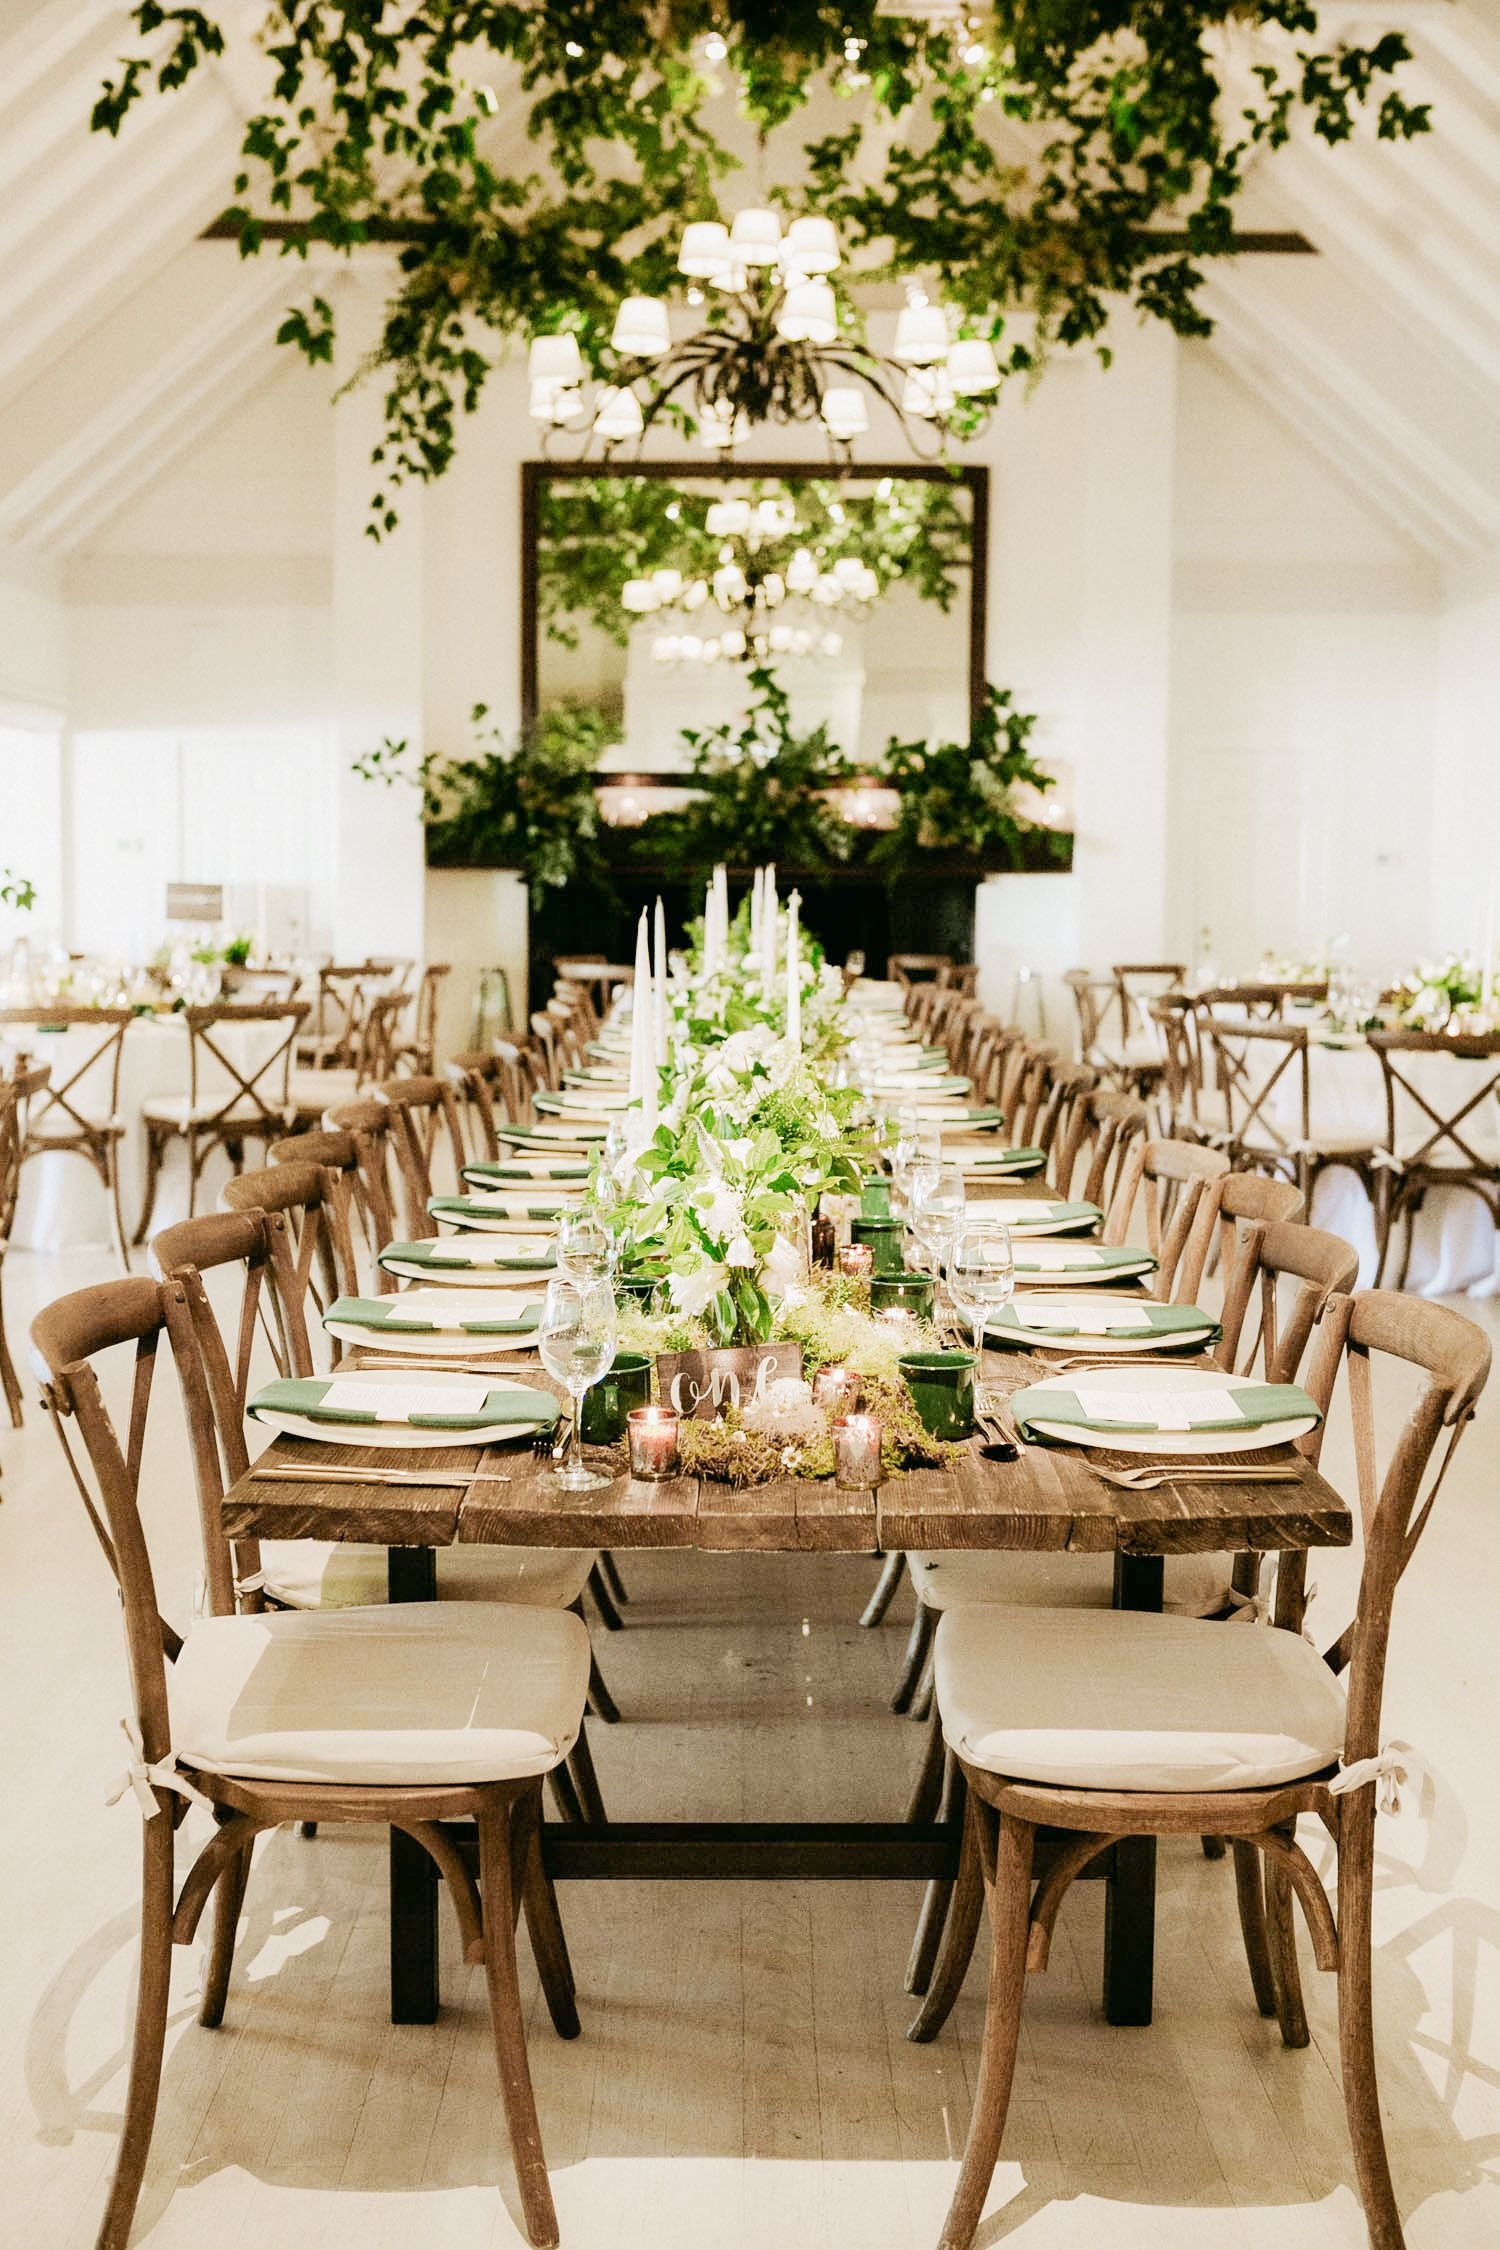 A CampThemed Wedding in Montauk, New York Green wedding